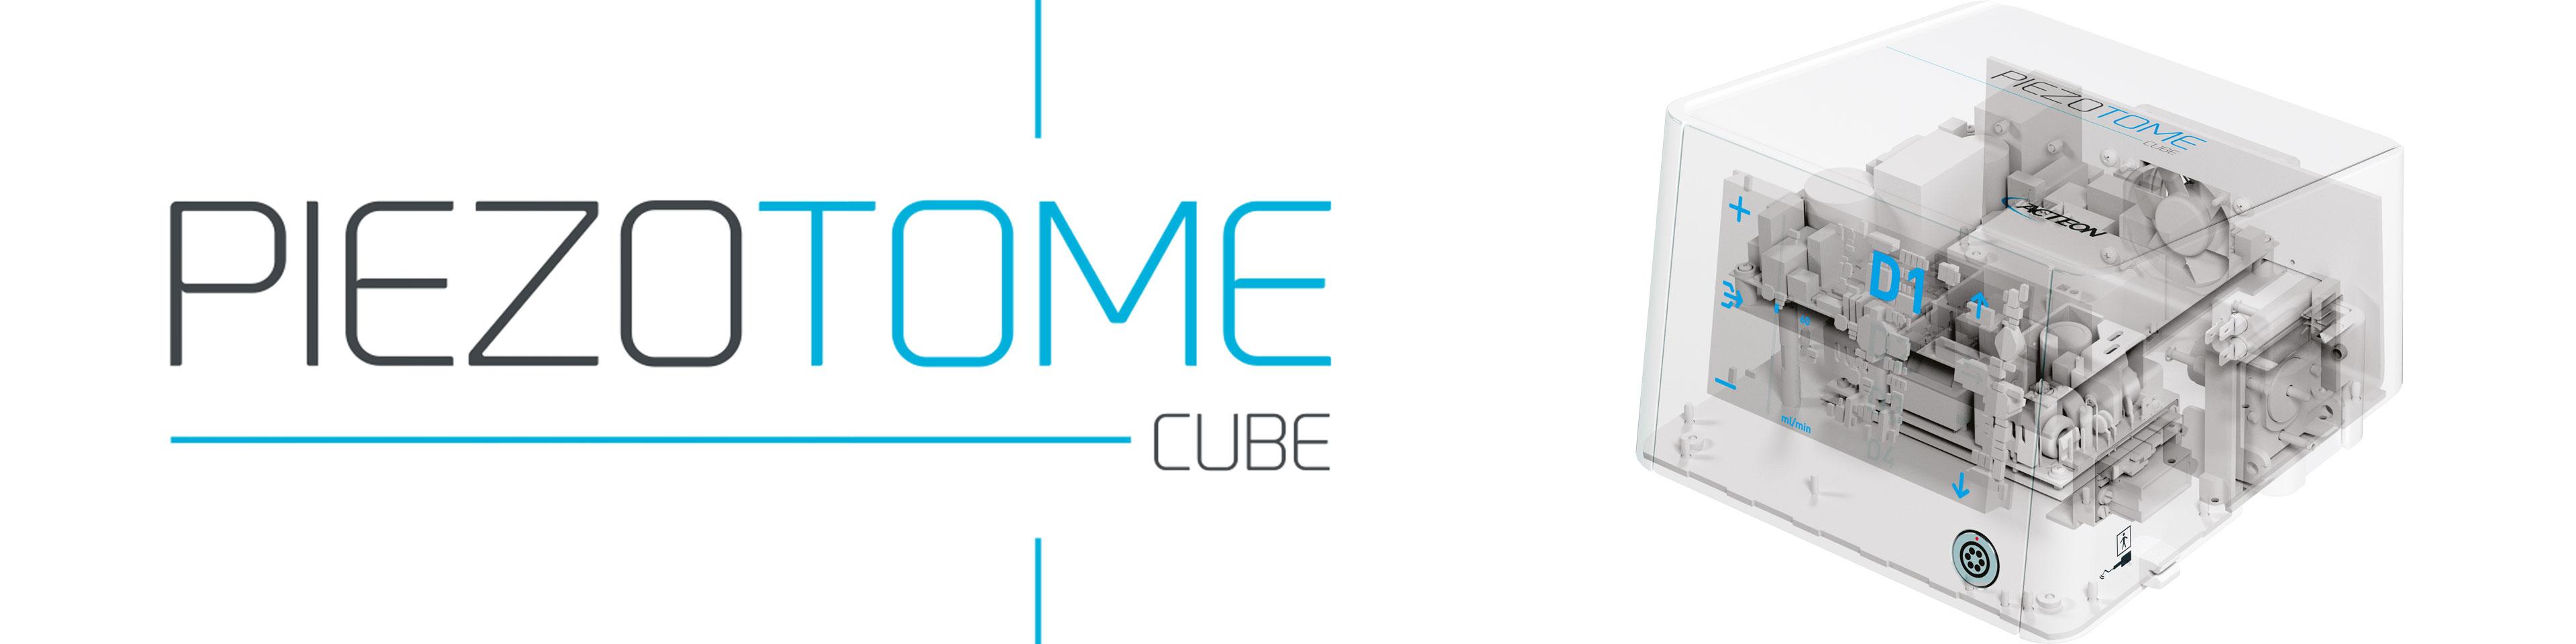 Acteon_Piezotome-Cube_Description_01